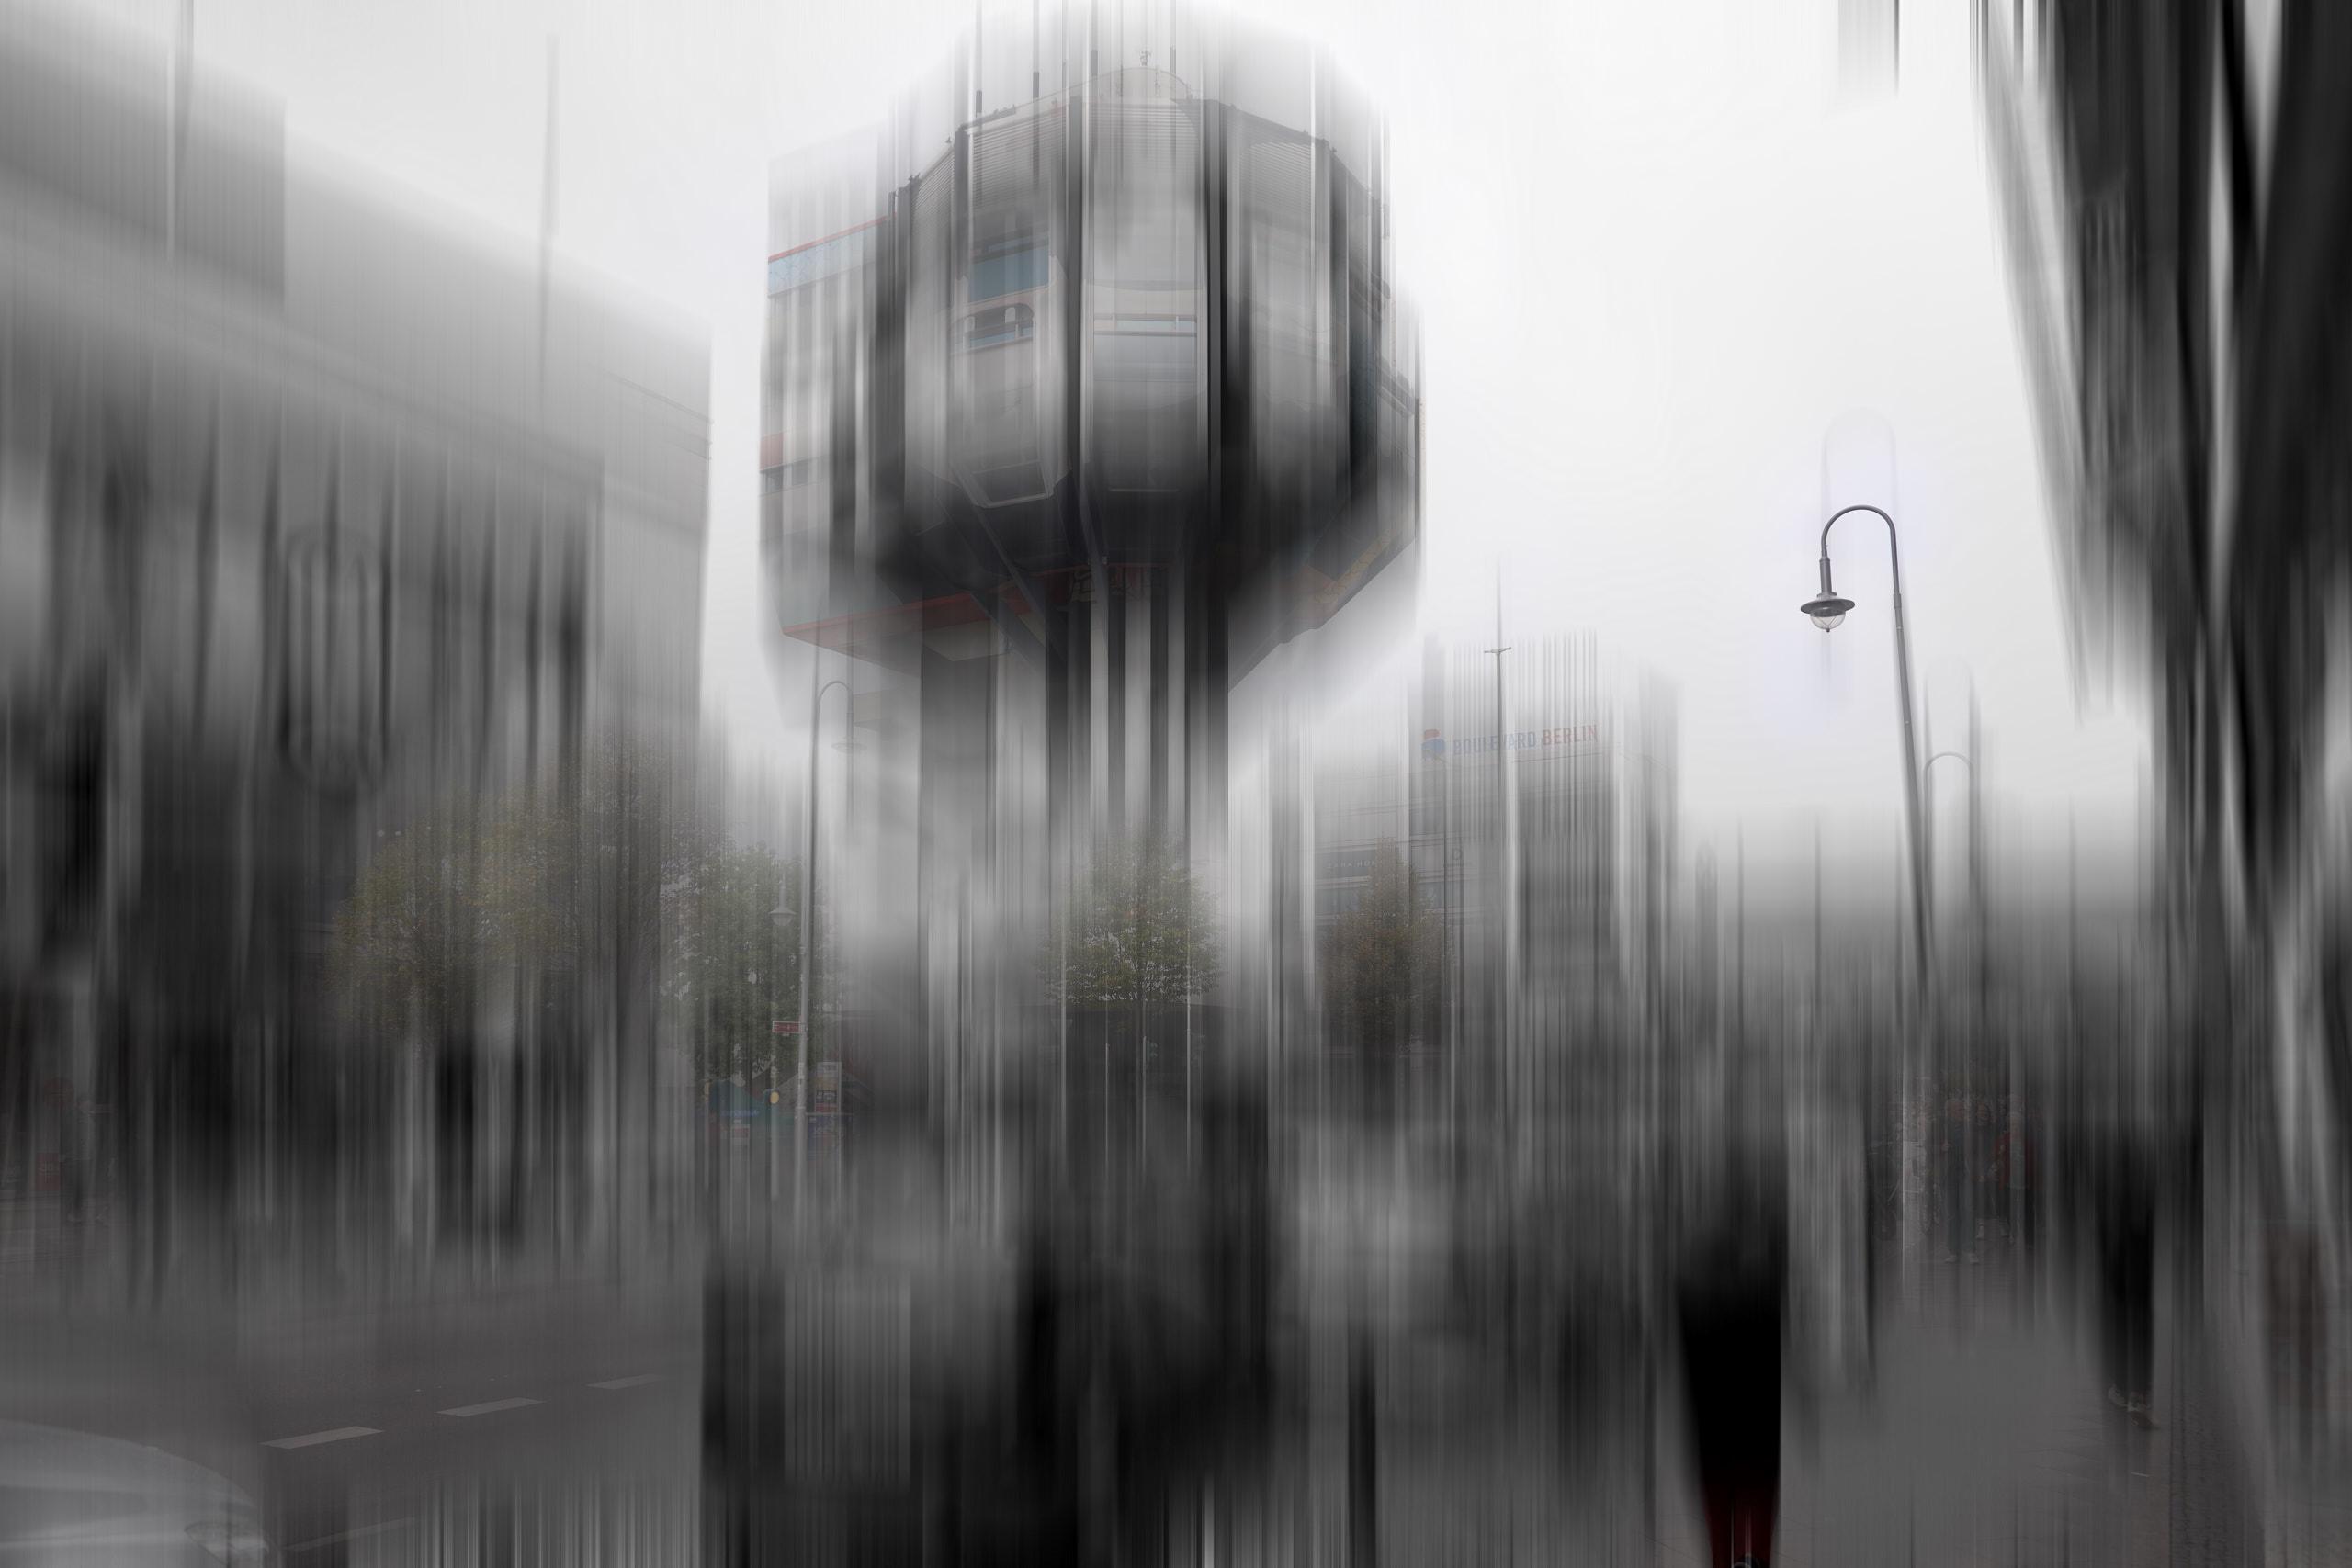 © 2018 Helge Hasenau, Berlin